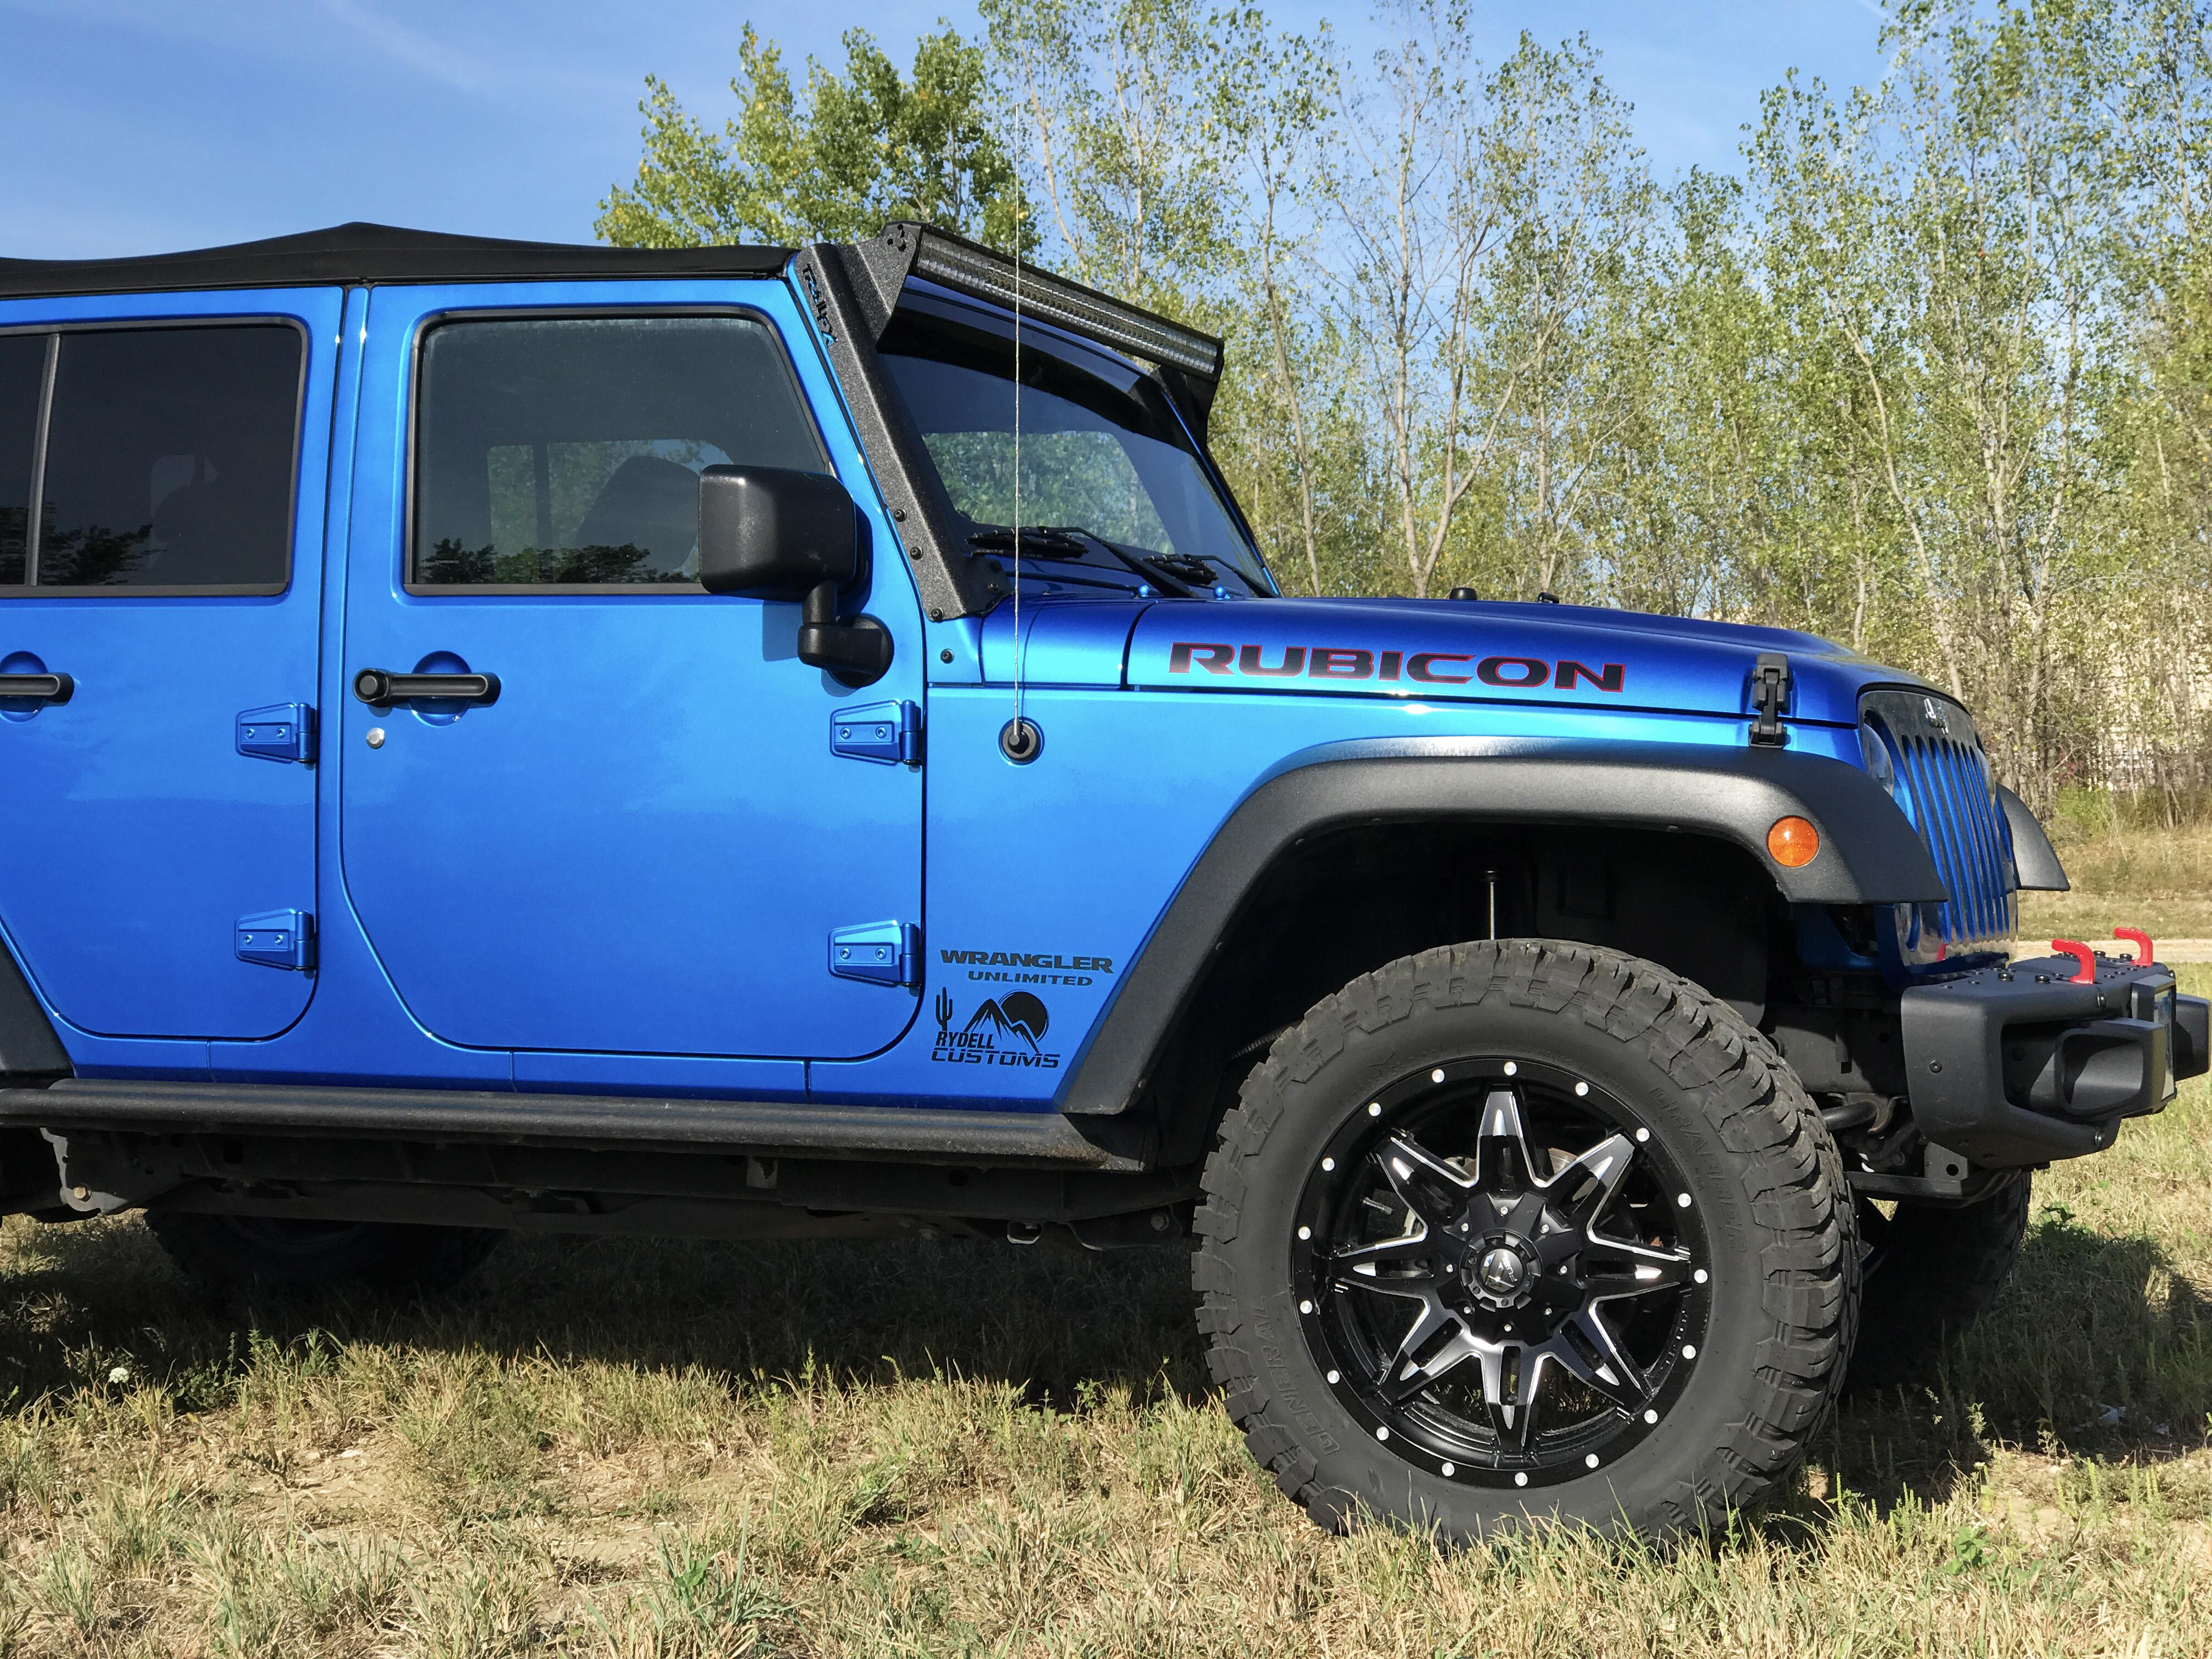 Blue Jeep Wrangler Rubiconer Rubicon